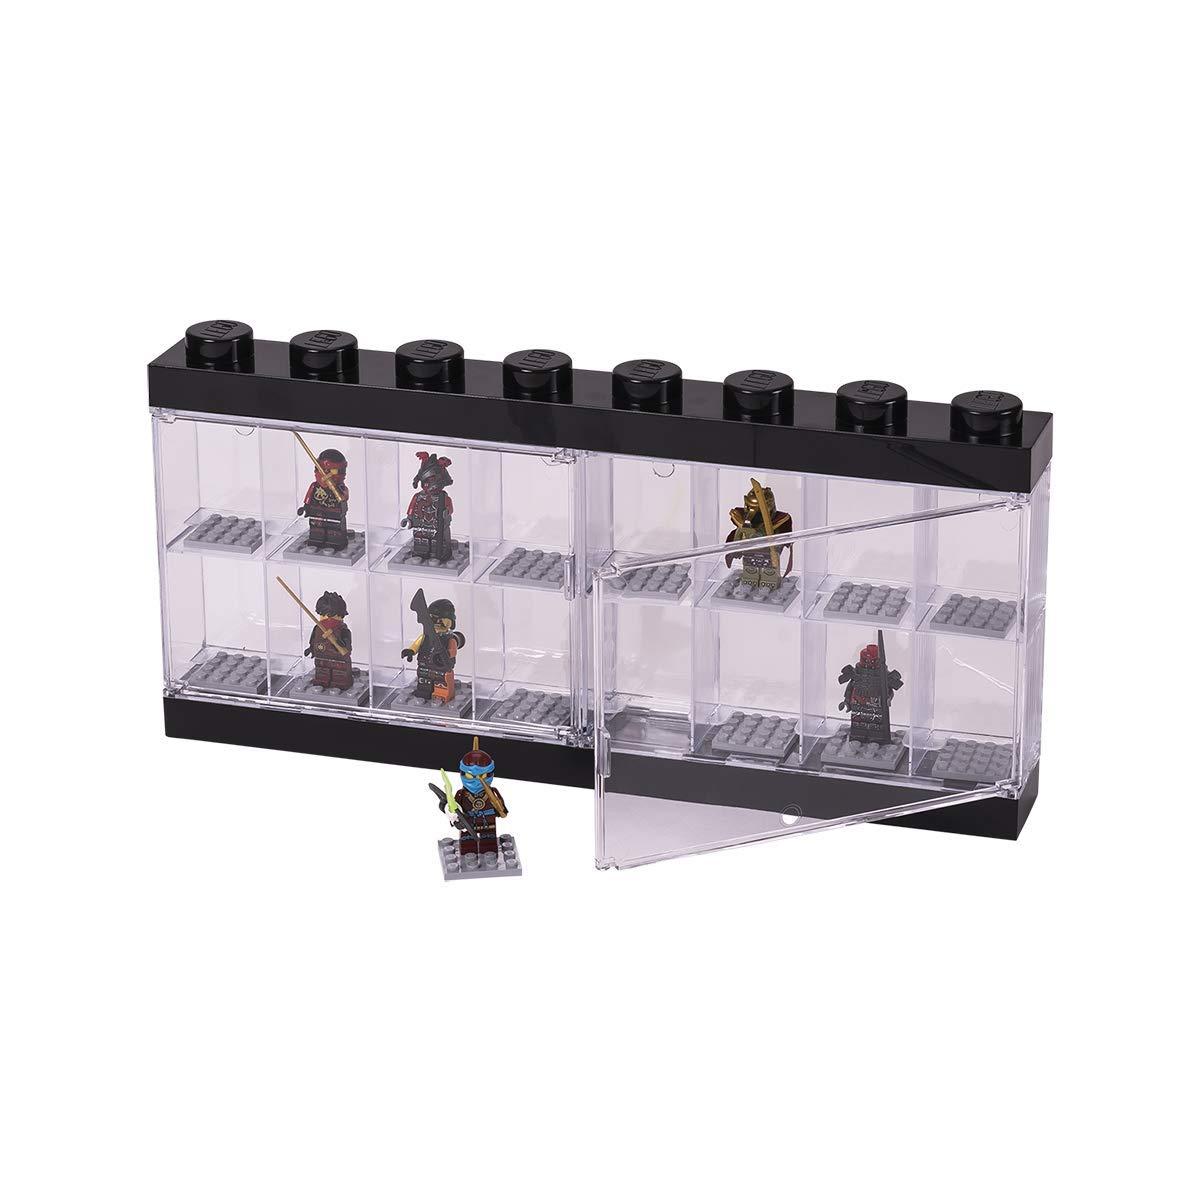 Bedwelming Amazon.com: LEGO Minifigure Display Case 16 Black, Large: Room @OS37